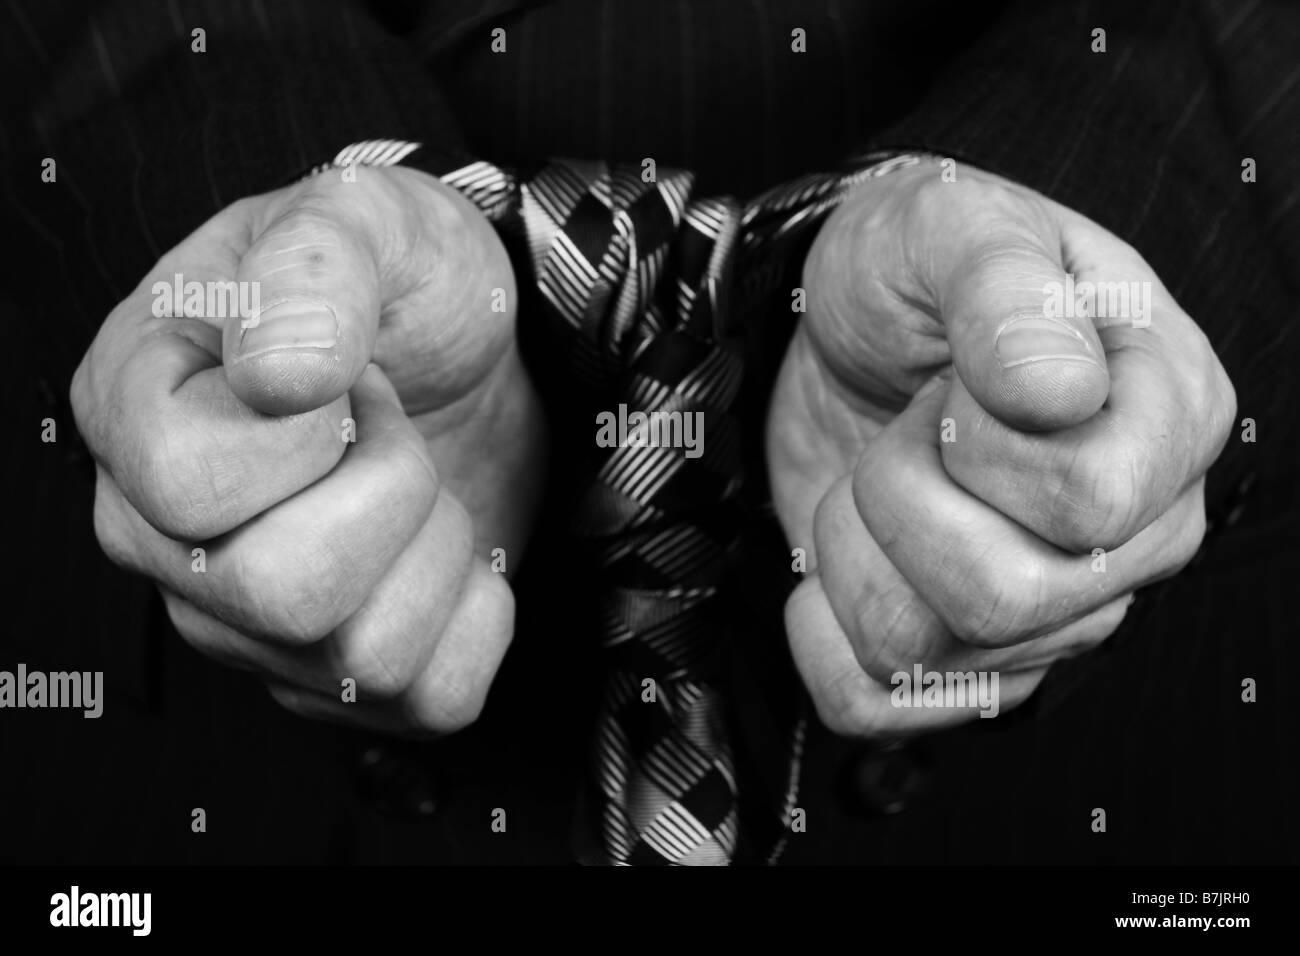 mans hands tied together - Stock Image